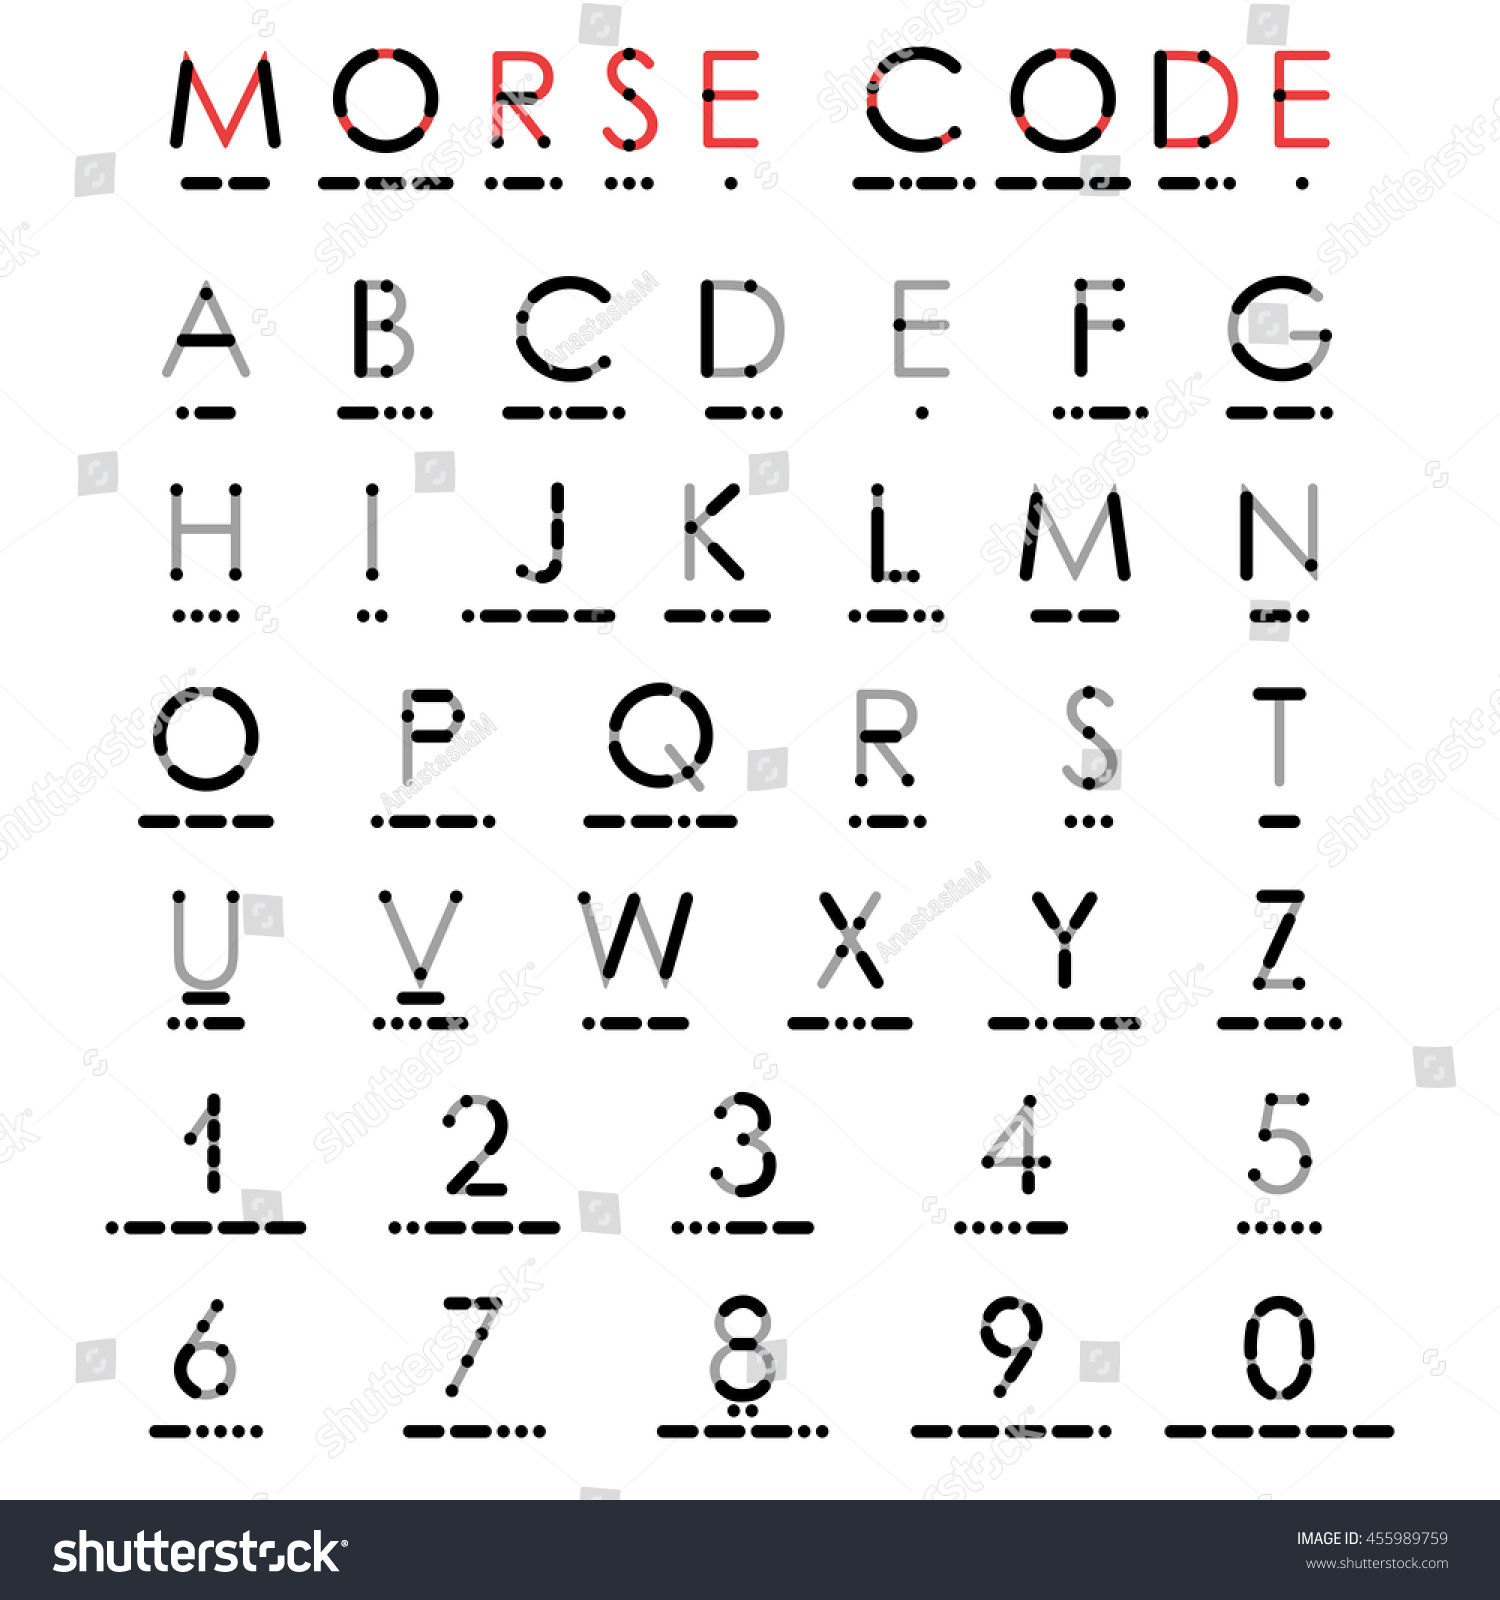 Latin alphabet numerals international morse code stock latin alphabet and numerals in international morse code visual presentation of use dots and dashes buycottarizona Choice Image